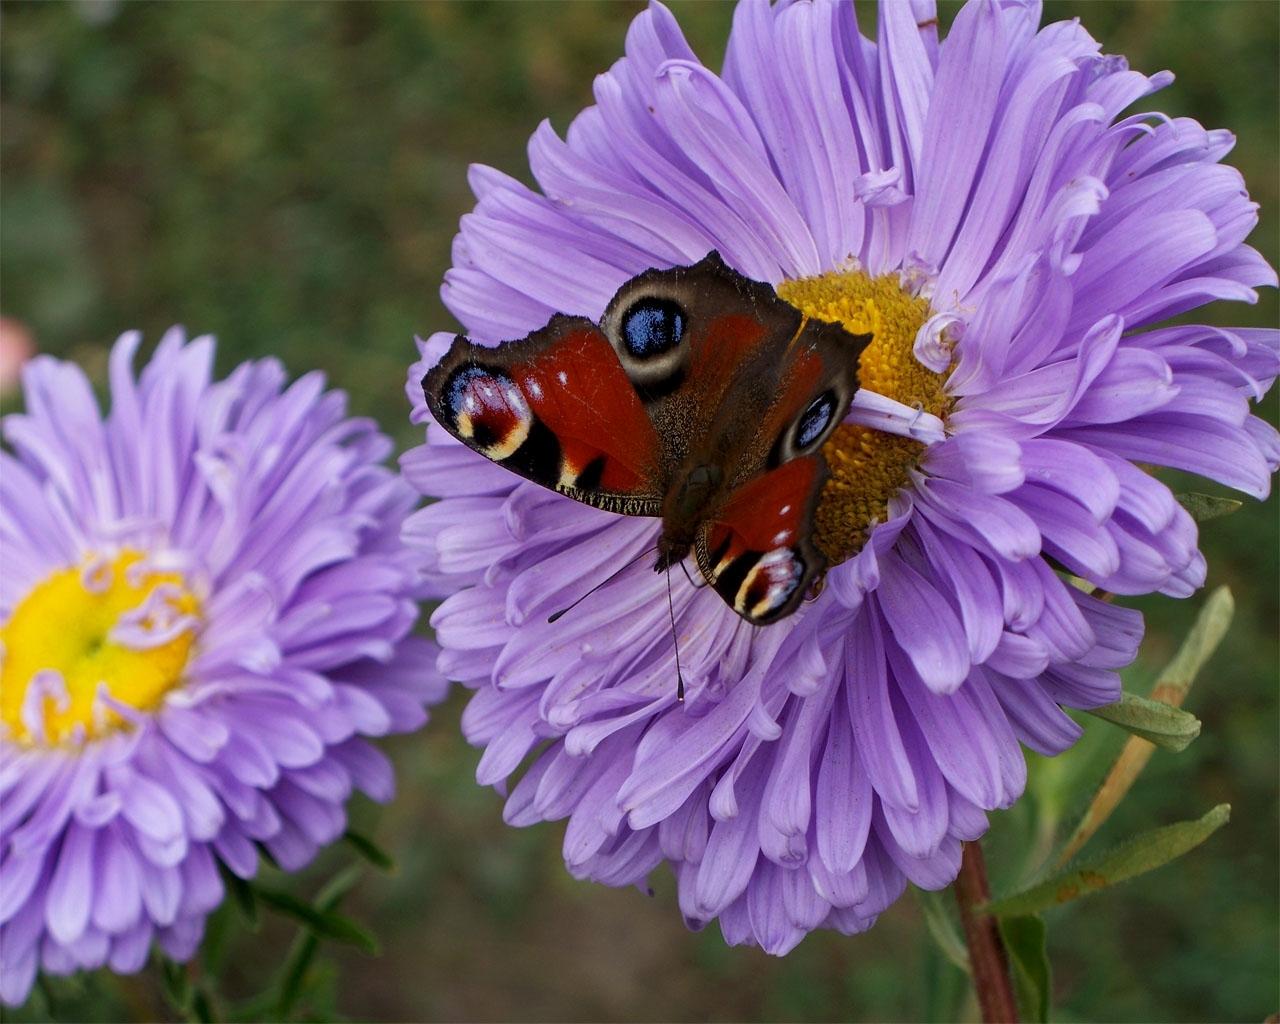 7028 descargar fondo de pantalla Plantas, Mariposas, Flores, Insectos: protectores de pantalla e imágenes gratis